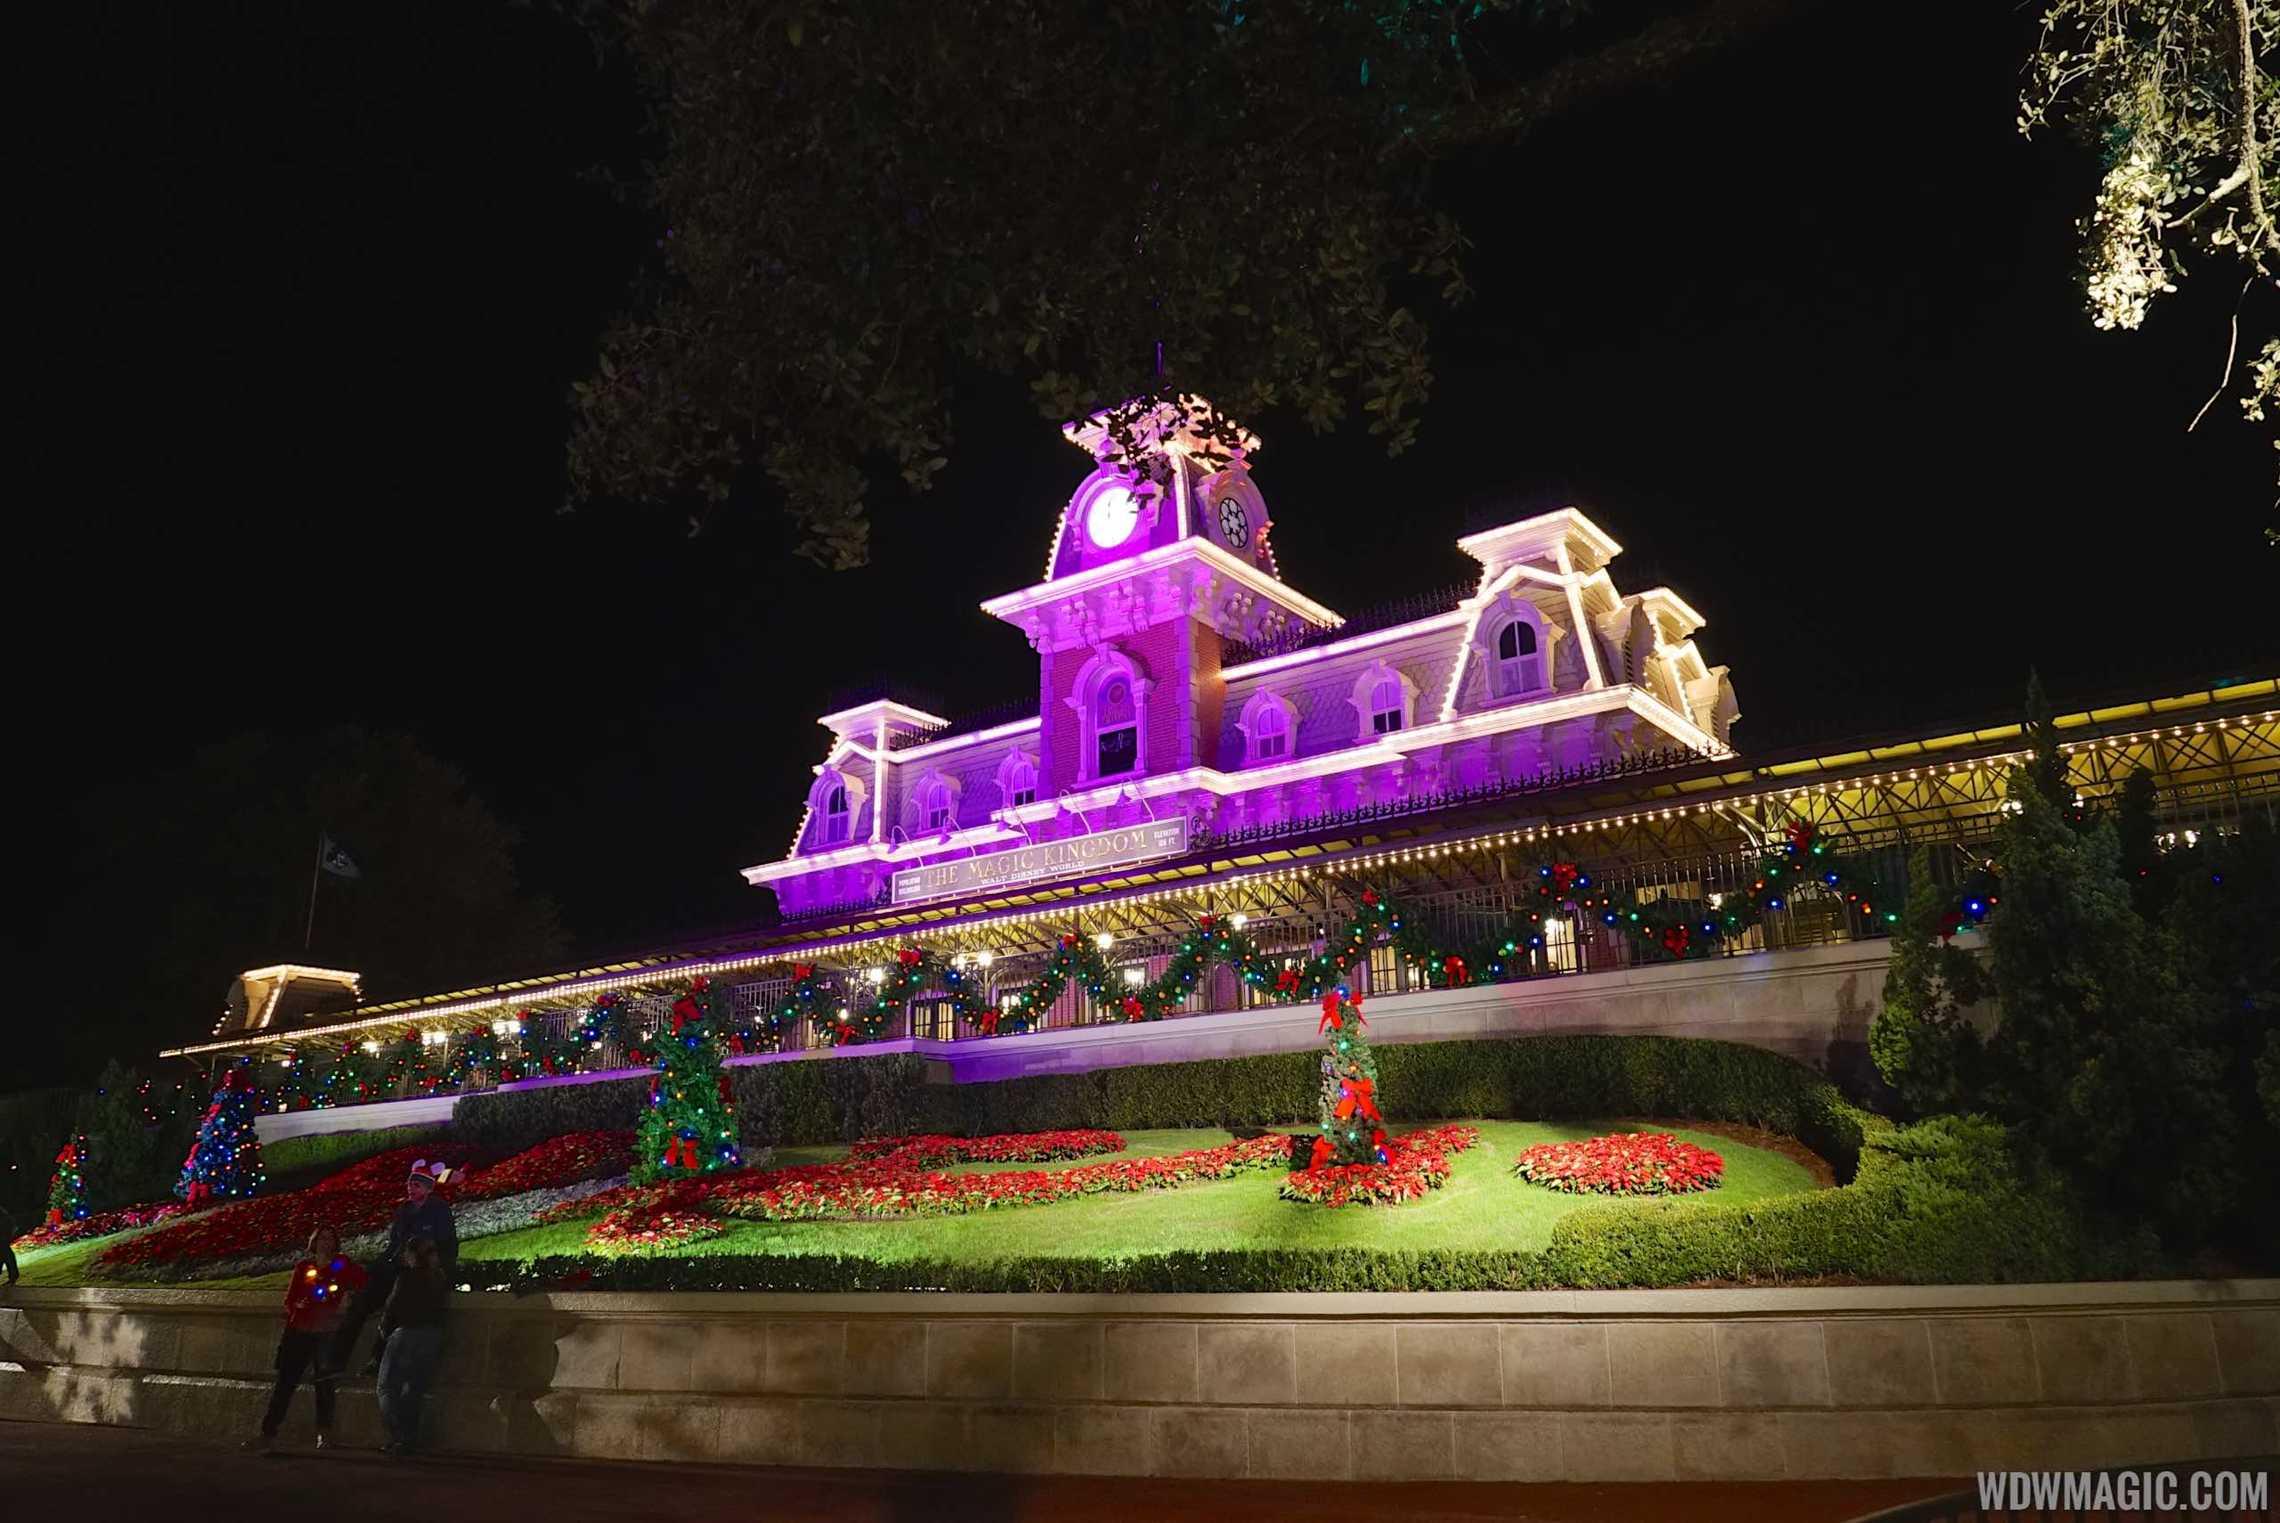 Disney world christmas decorations 2014 - Magic Kingdom Decorations